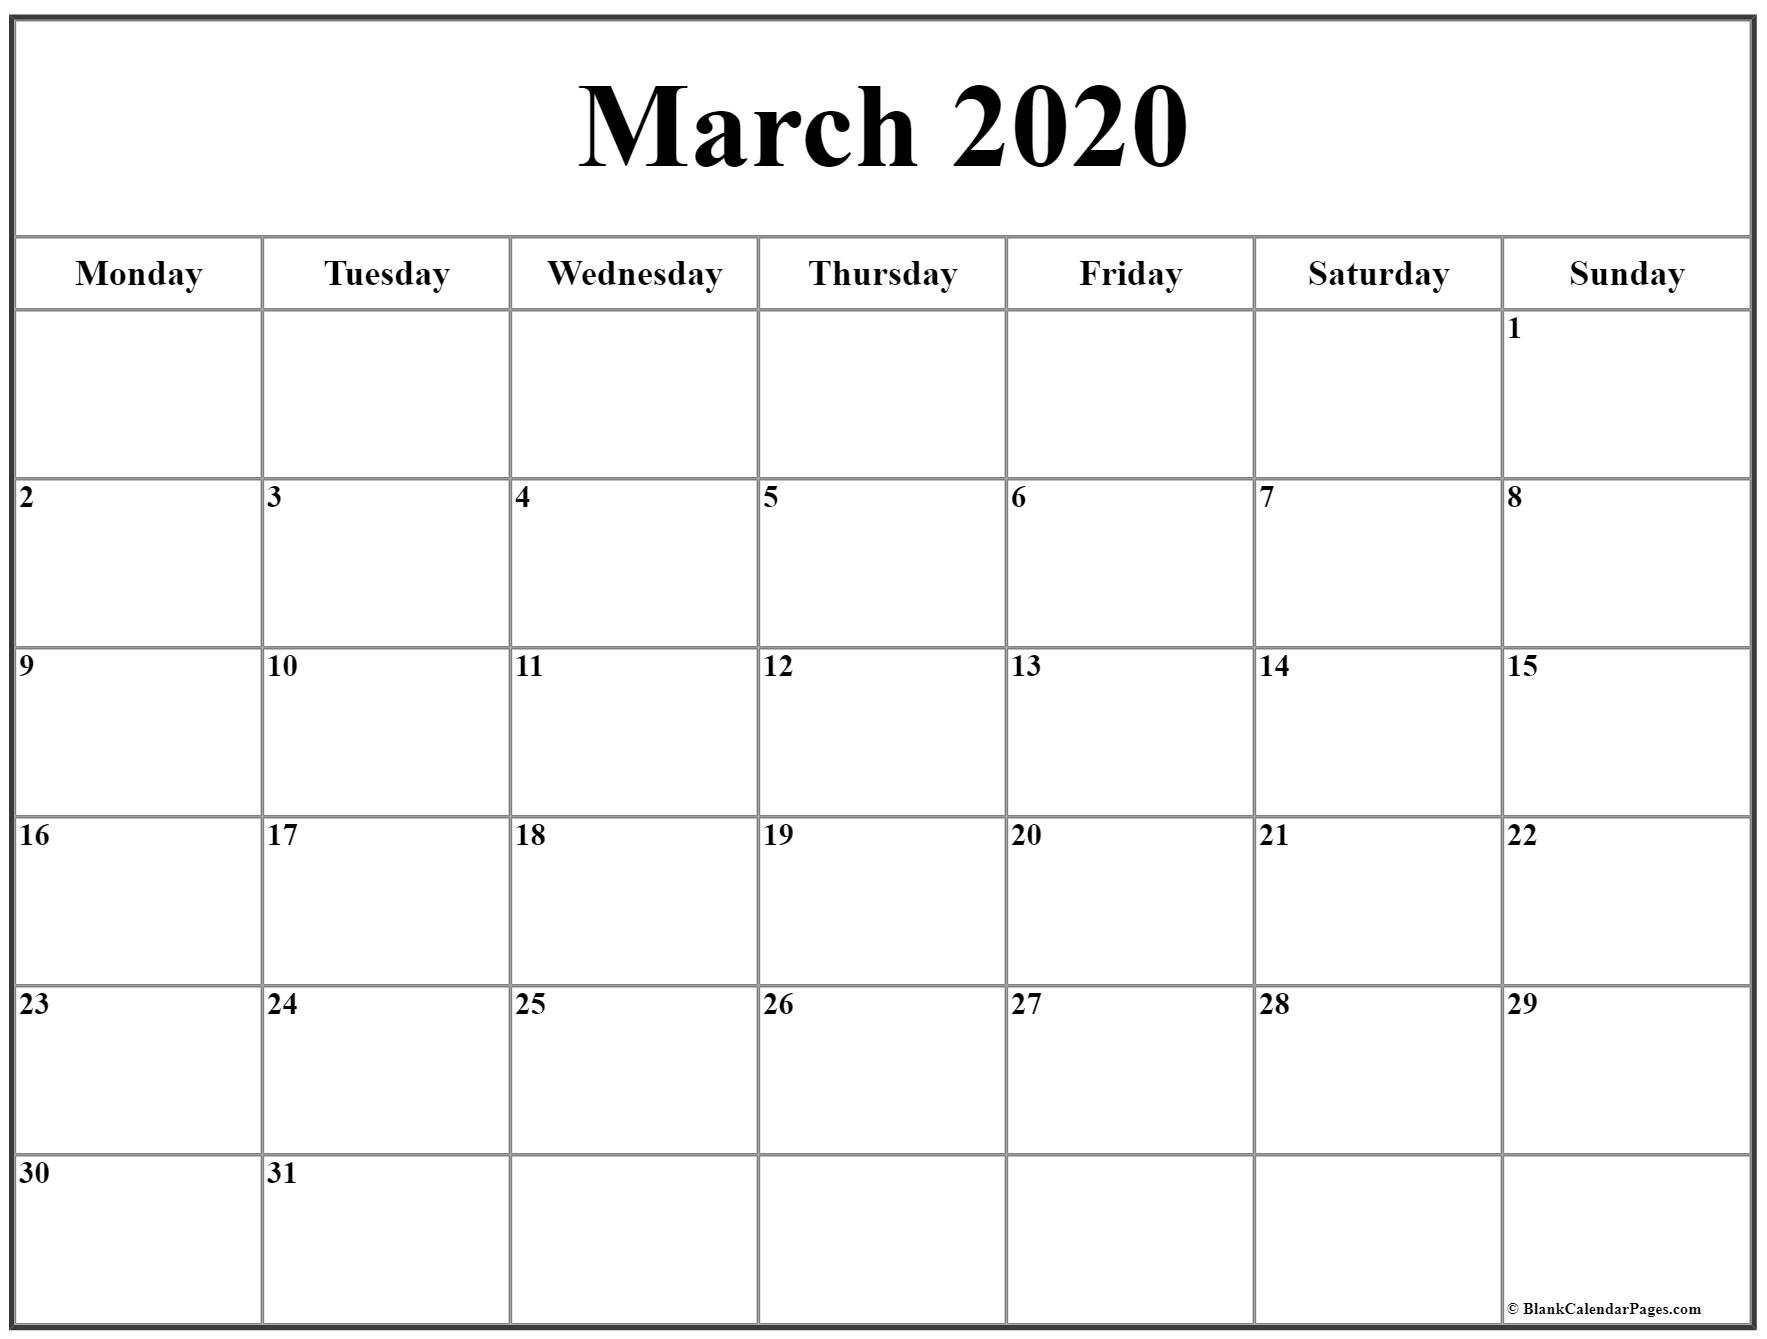 March 2020 Monday Calendar   Monday To Sunday Calendar Saturday To Friday